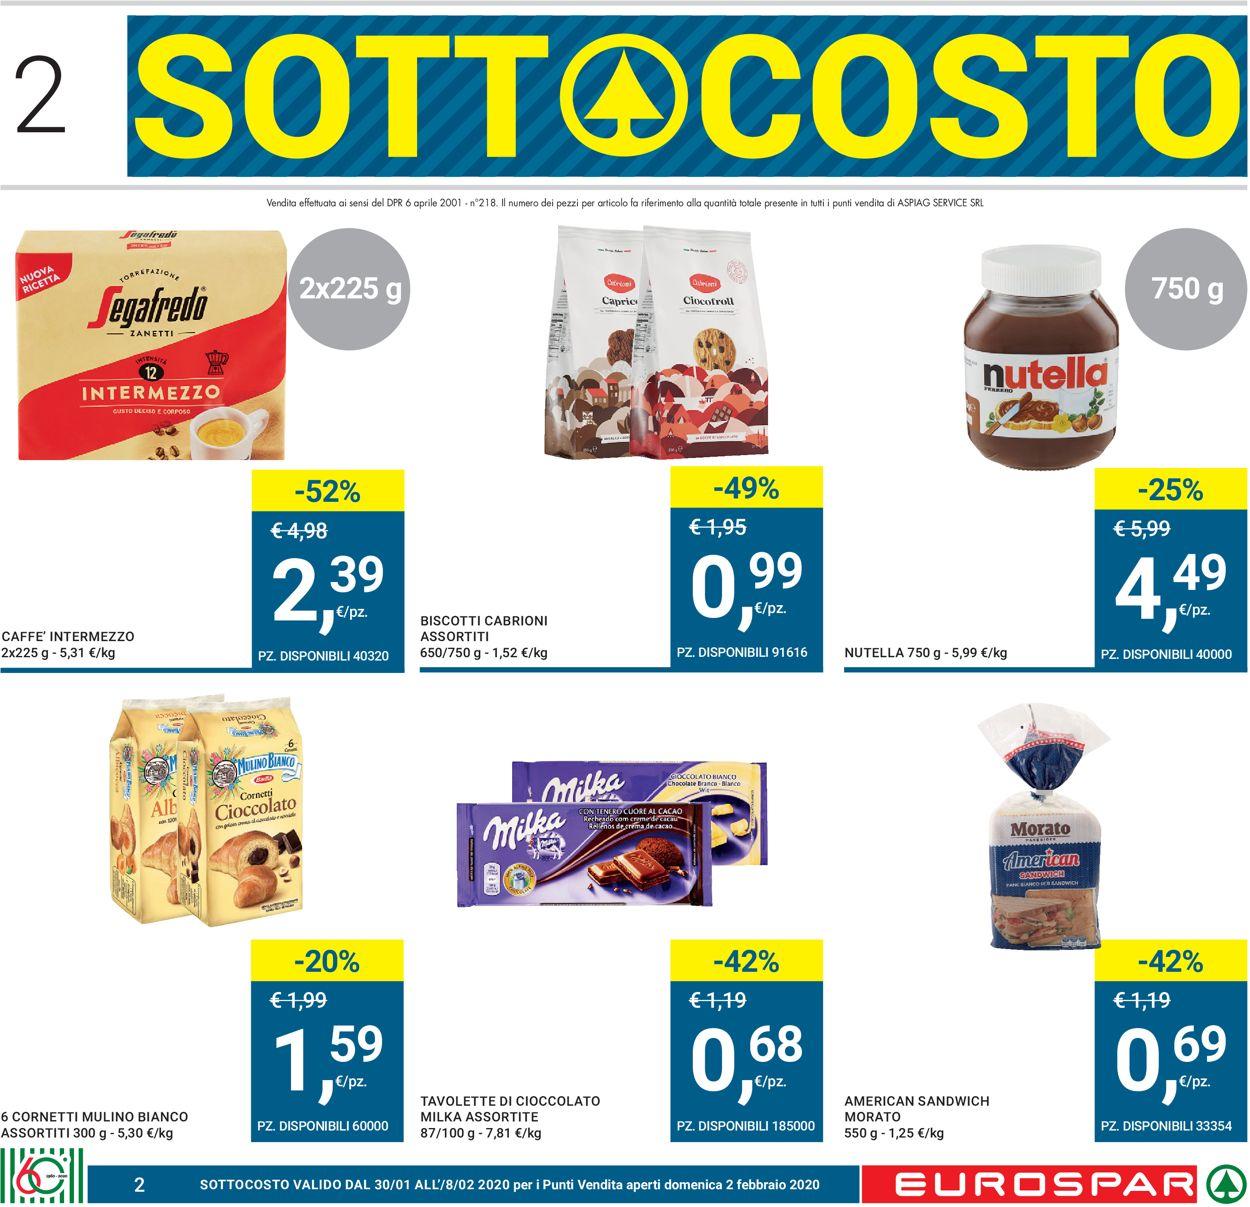 Volantino Interspar - Offerte 30/01-12/02/2020 (Pagina 2)